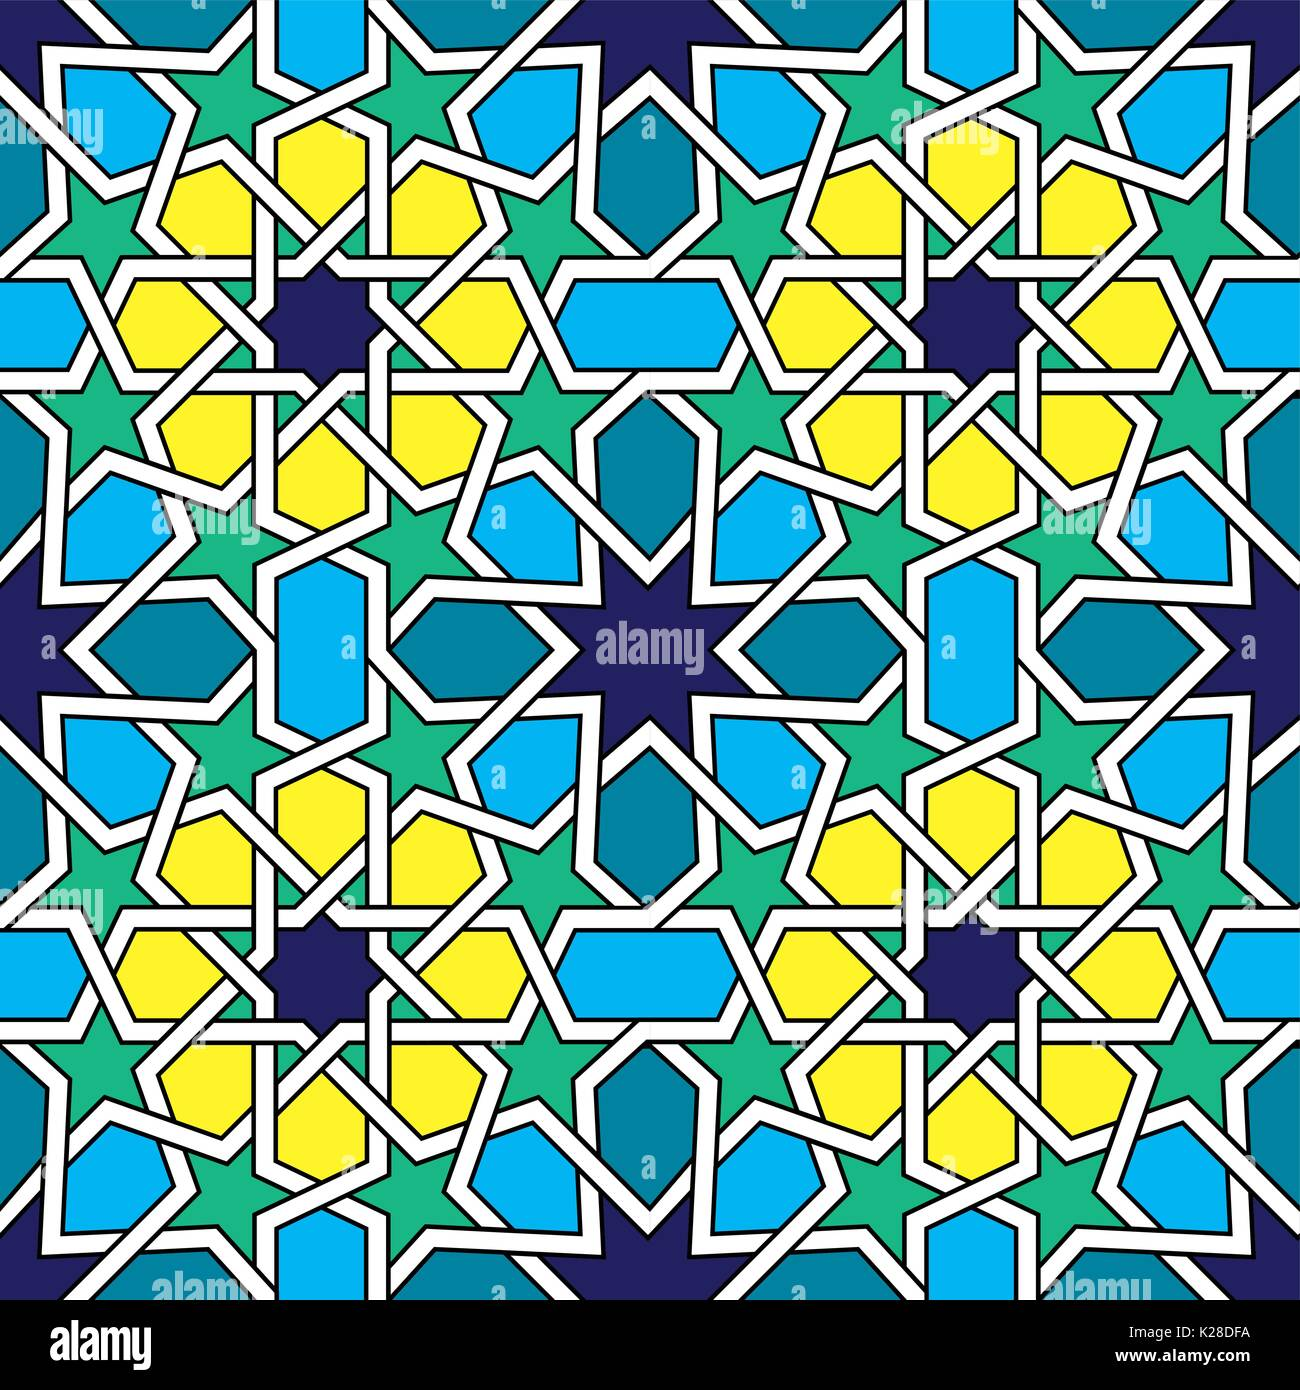 Moroccan Tiles Pattern Stock Photos & Moroccan Tiles Pattern Stock ...